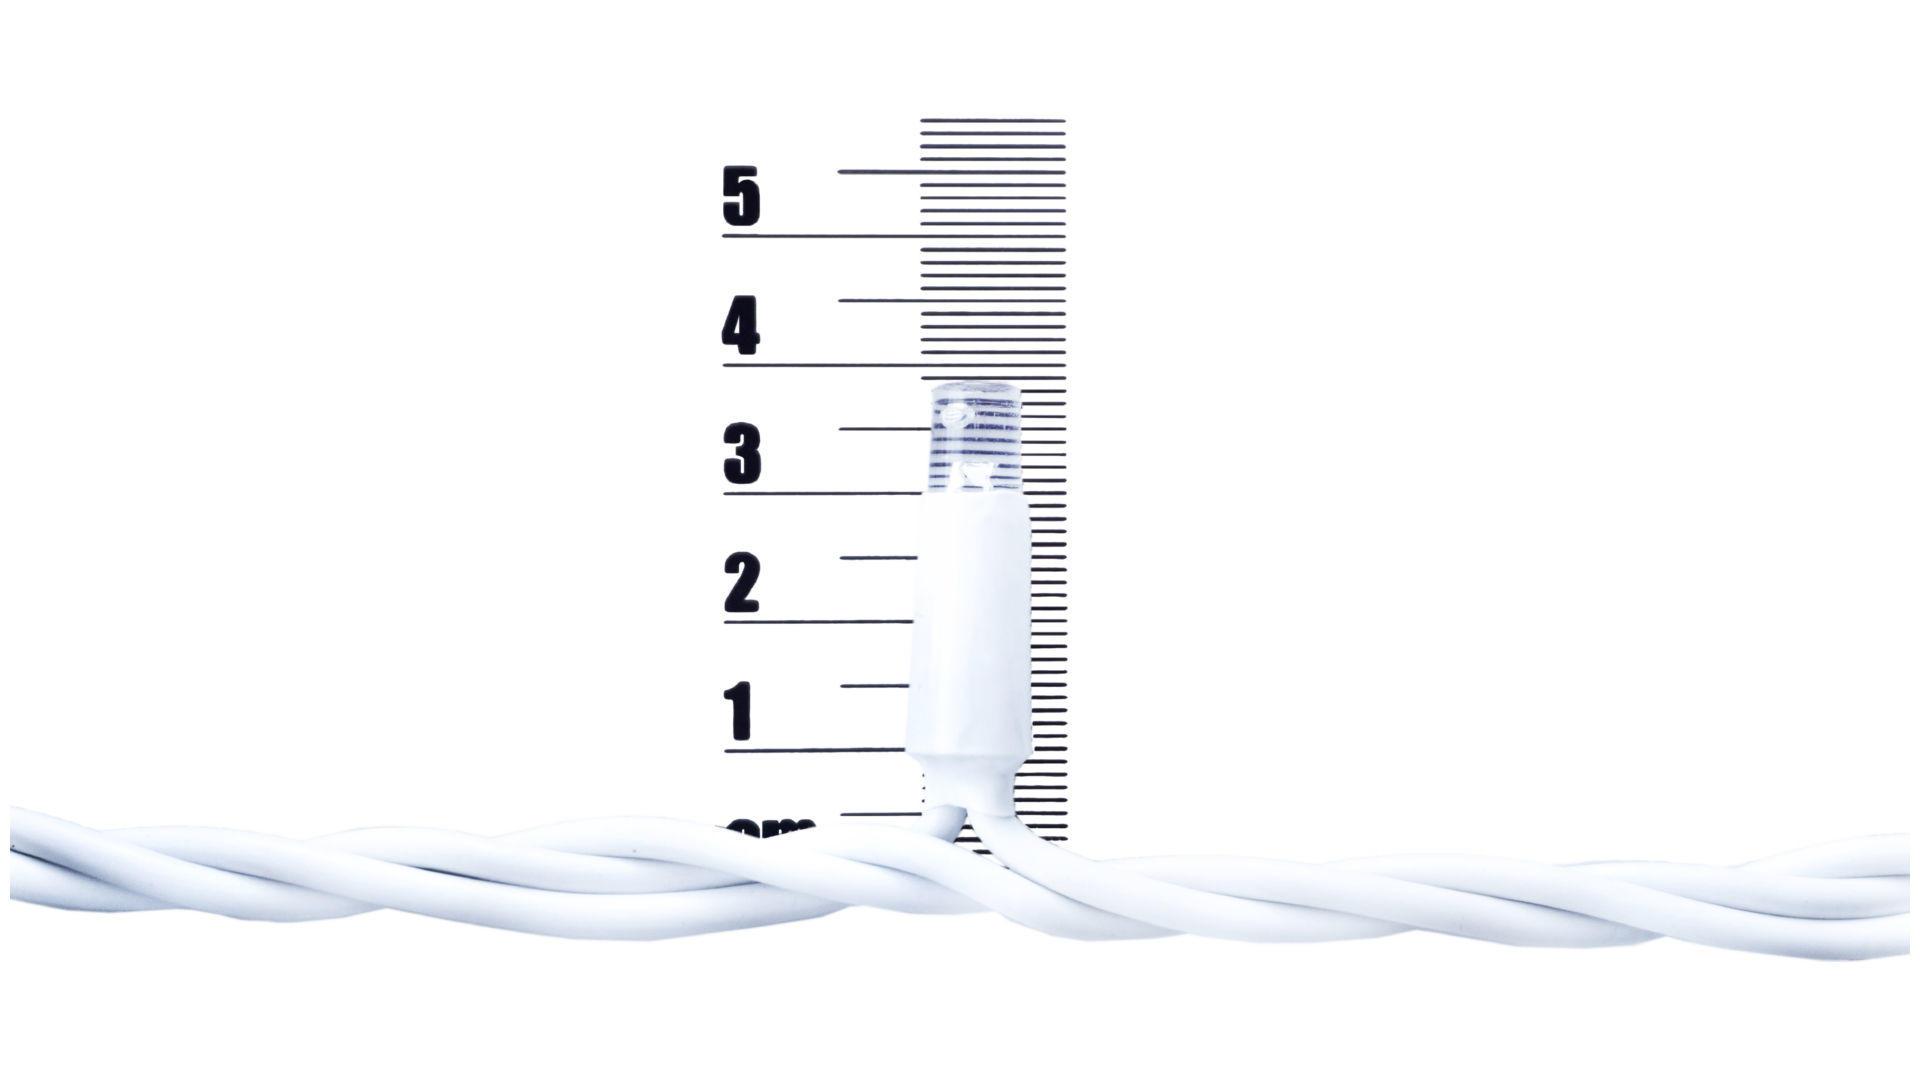 Гирлянда-дождик уличная светодиодная PRC WP - 100 LED белая Blue 2